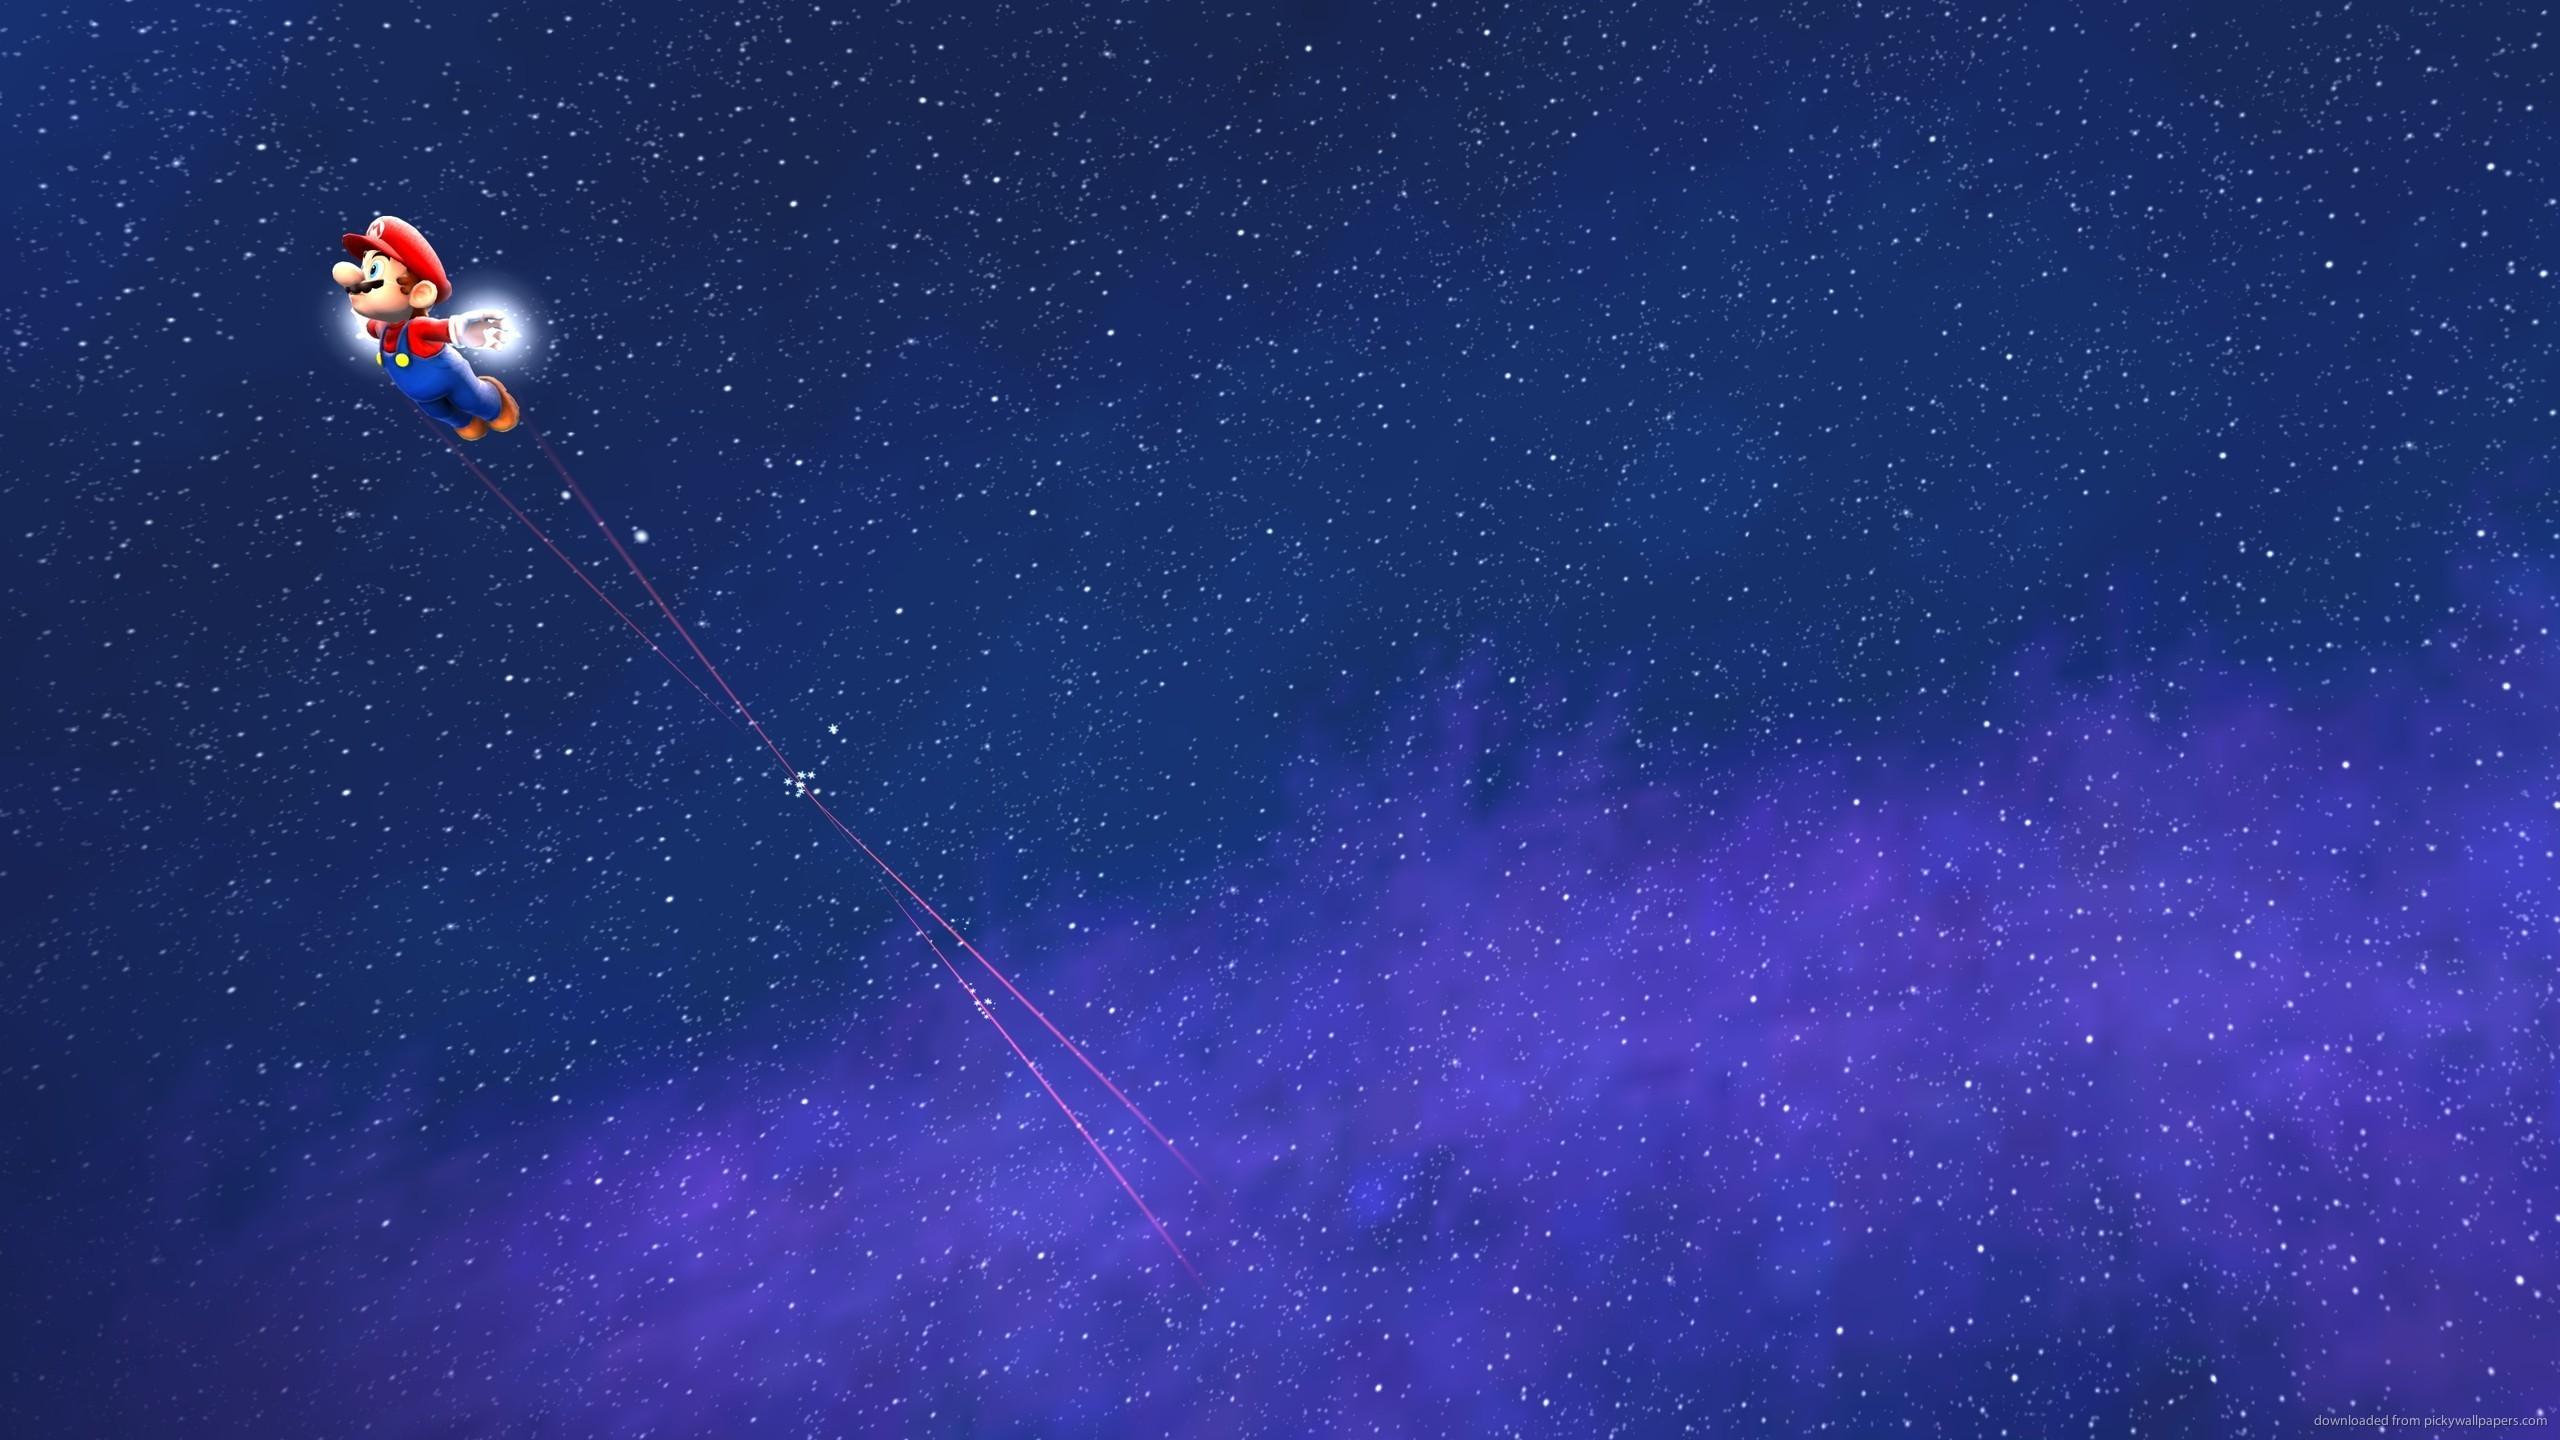 Super Mario Galaxy In Space for 2560×1440